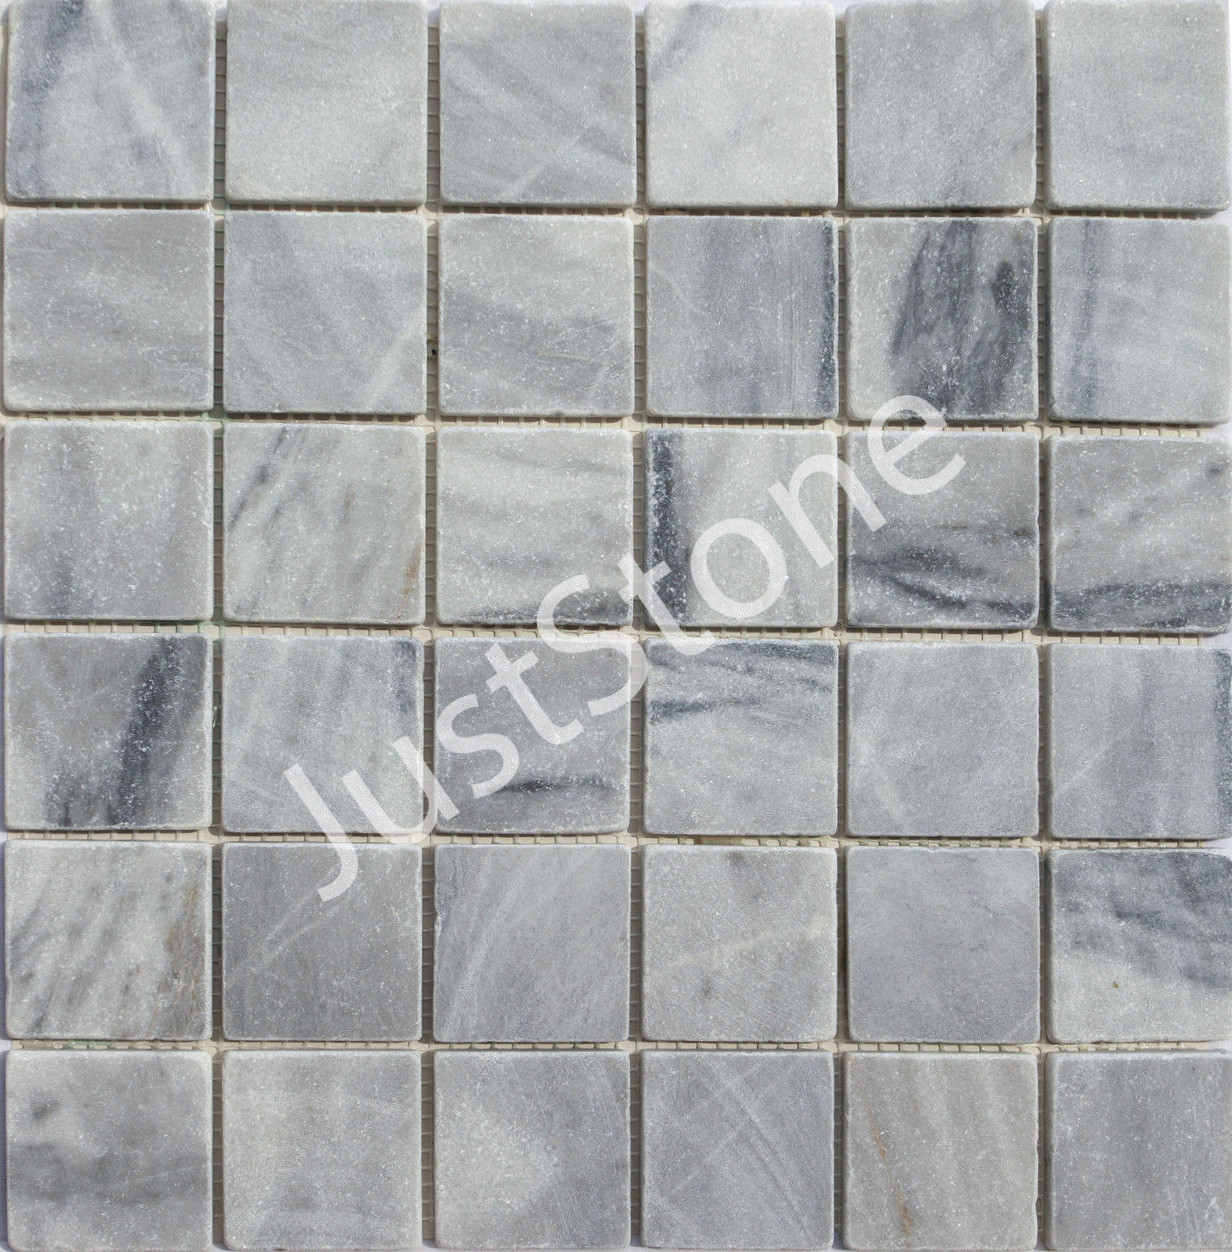 Мраморная Мозаика Стар.Валт. МКР-3СВ (47х47) 6 мм Grey Mix